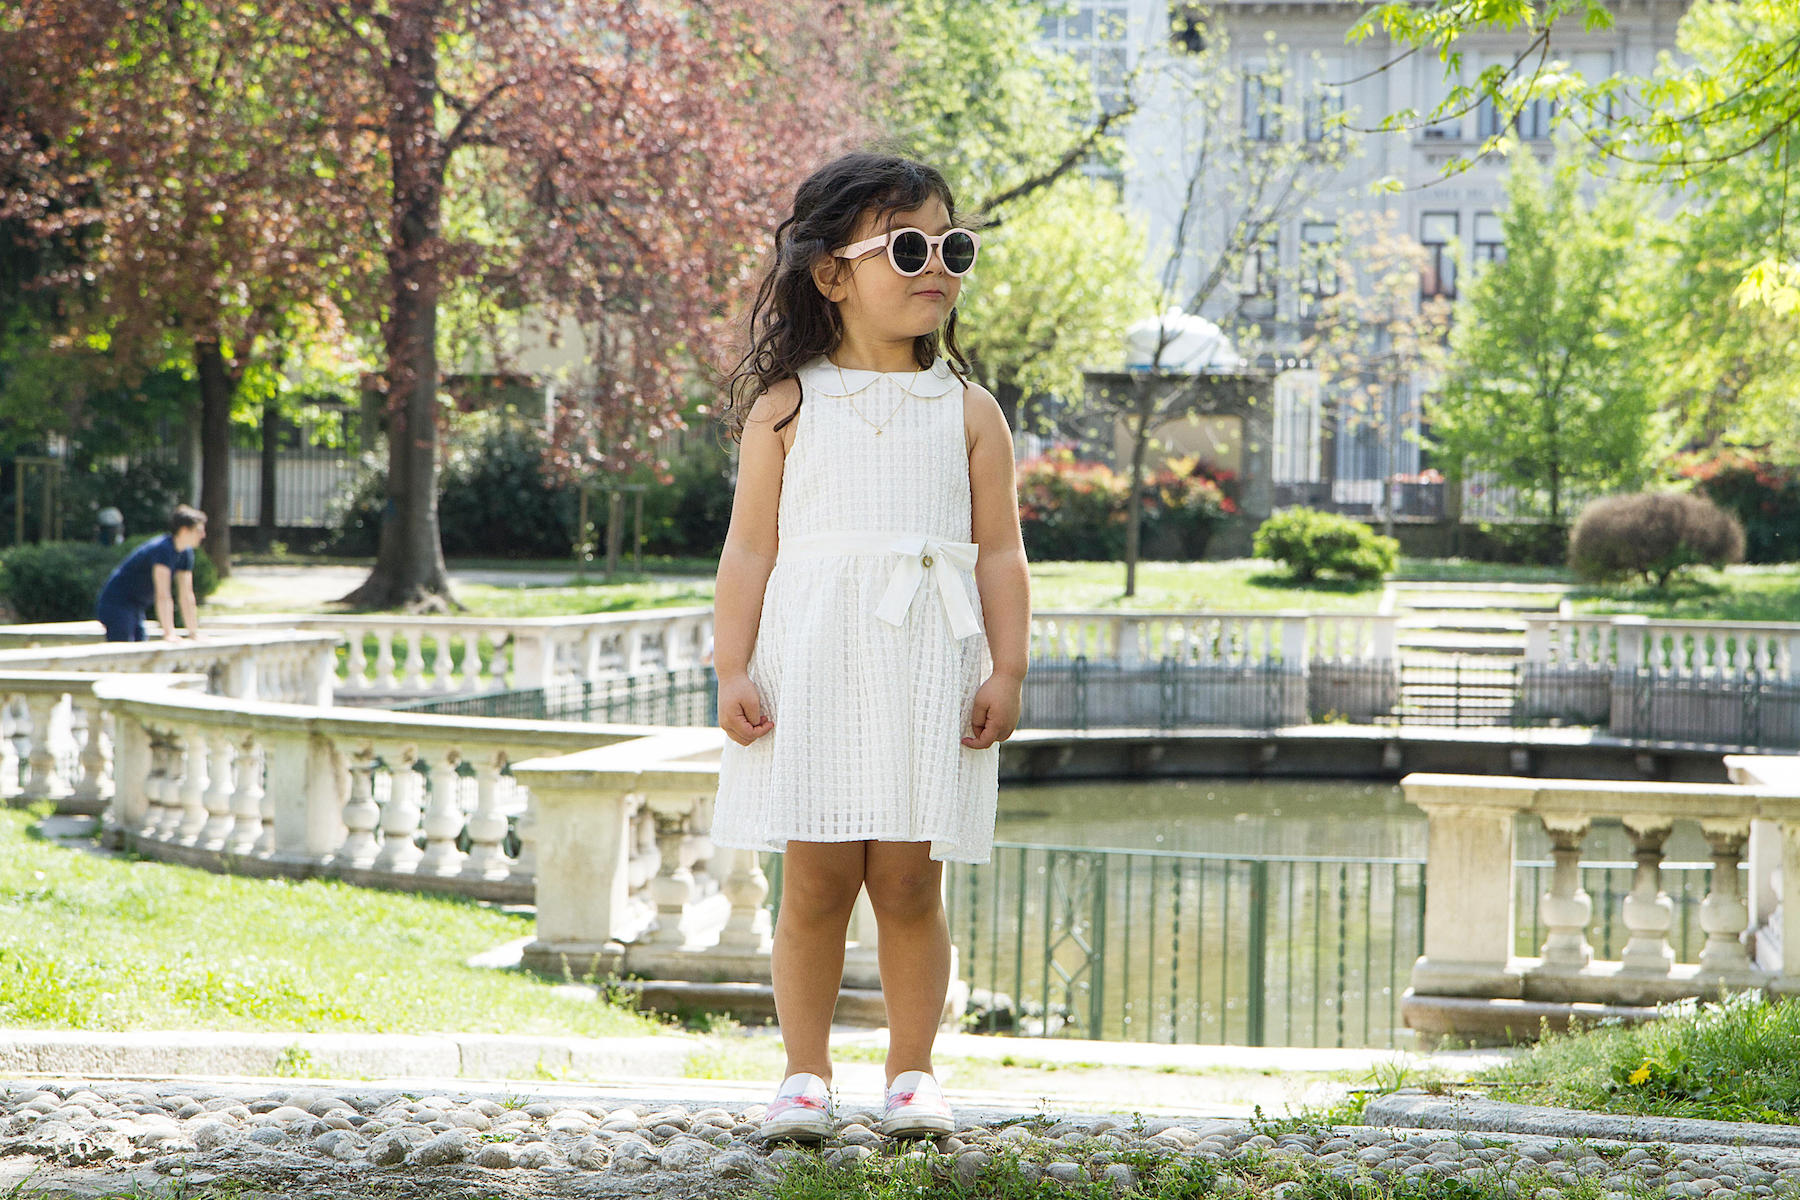 Digital Modern Family, Chloe Parodi, iDO